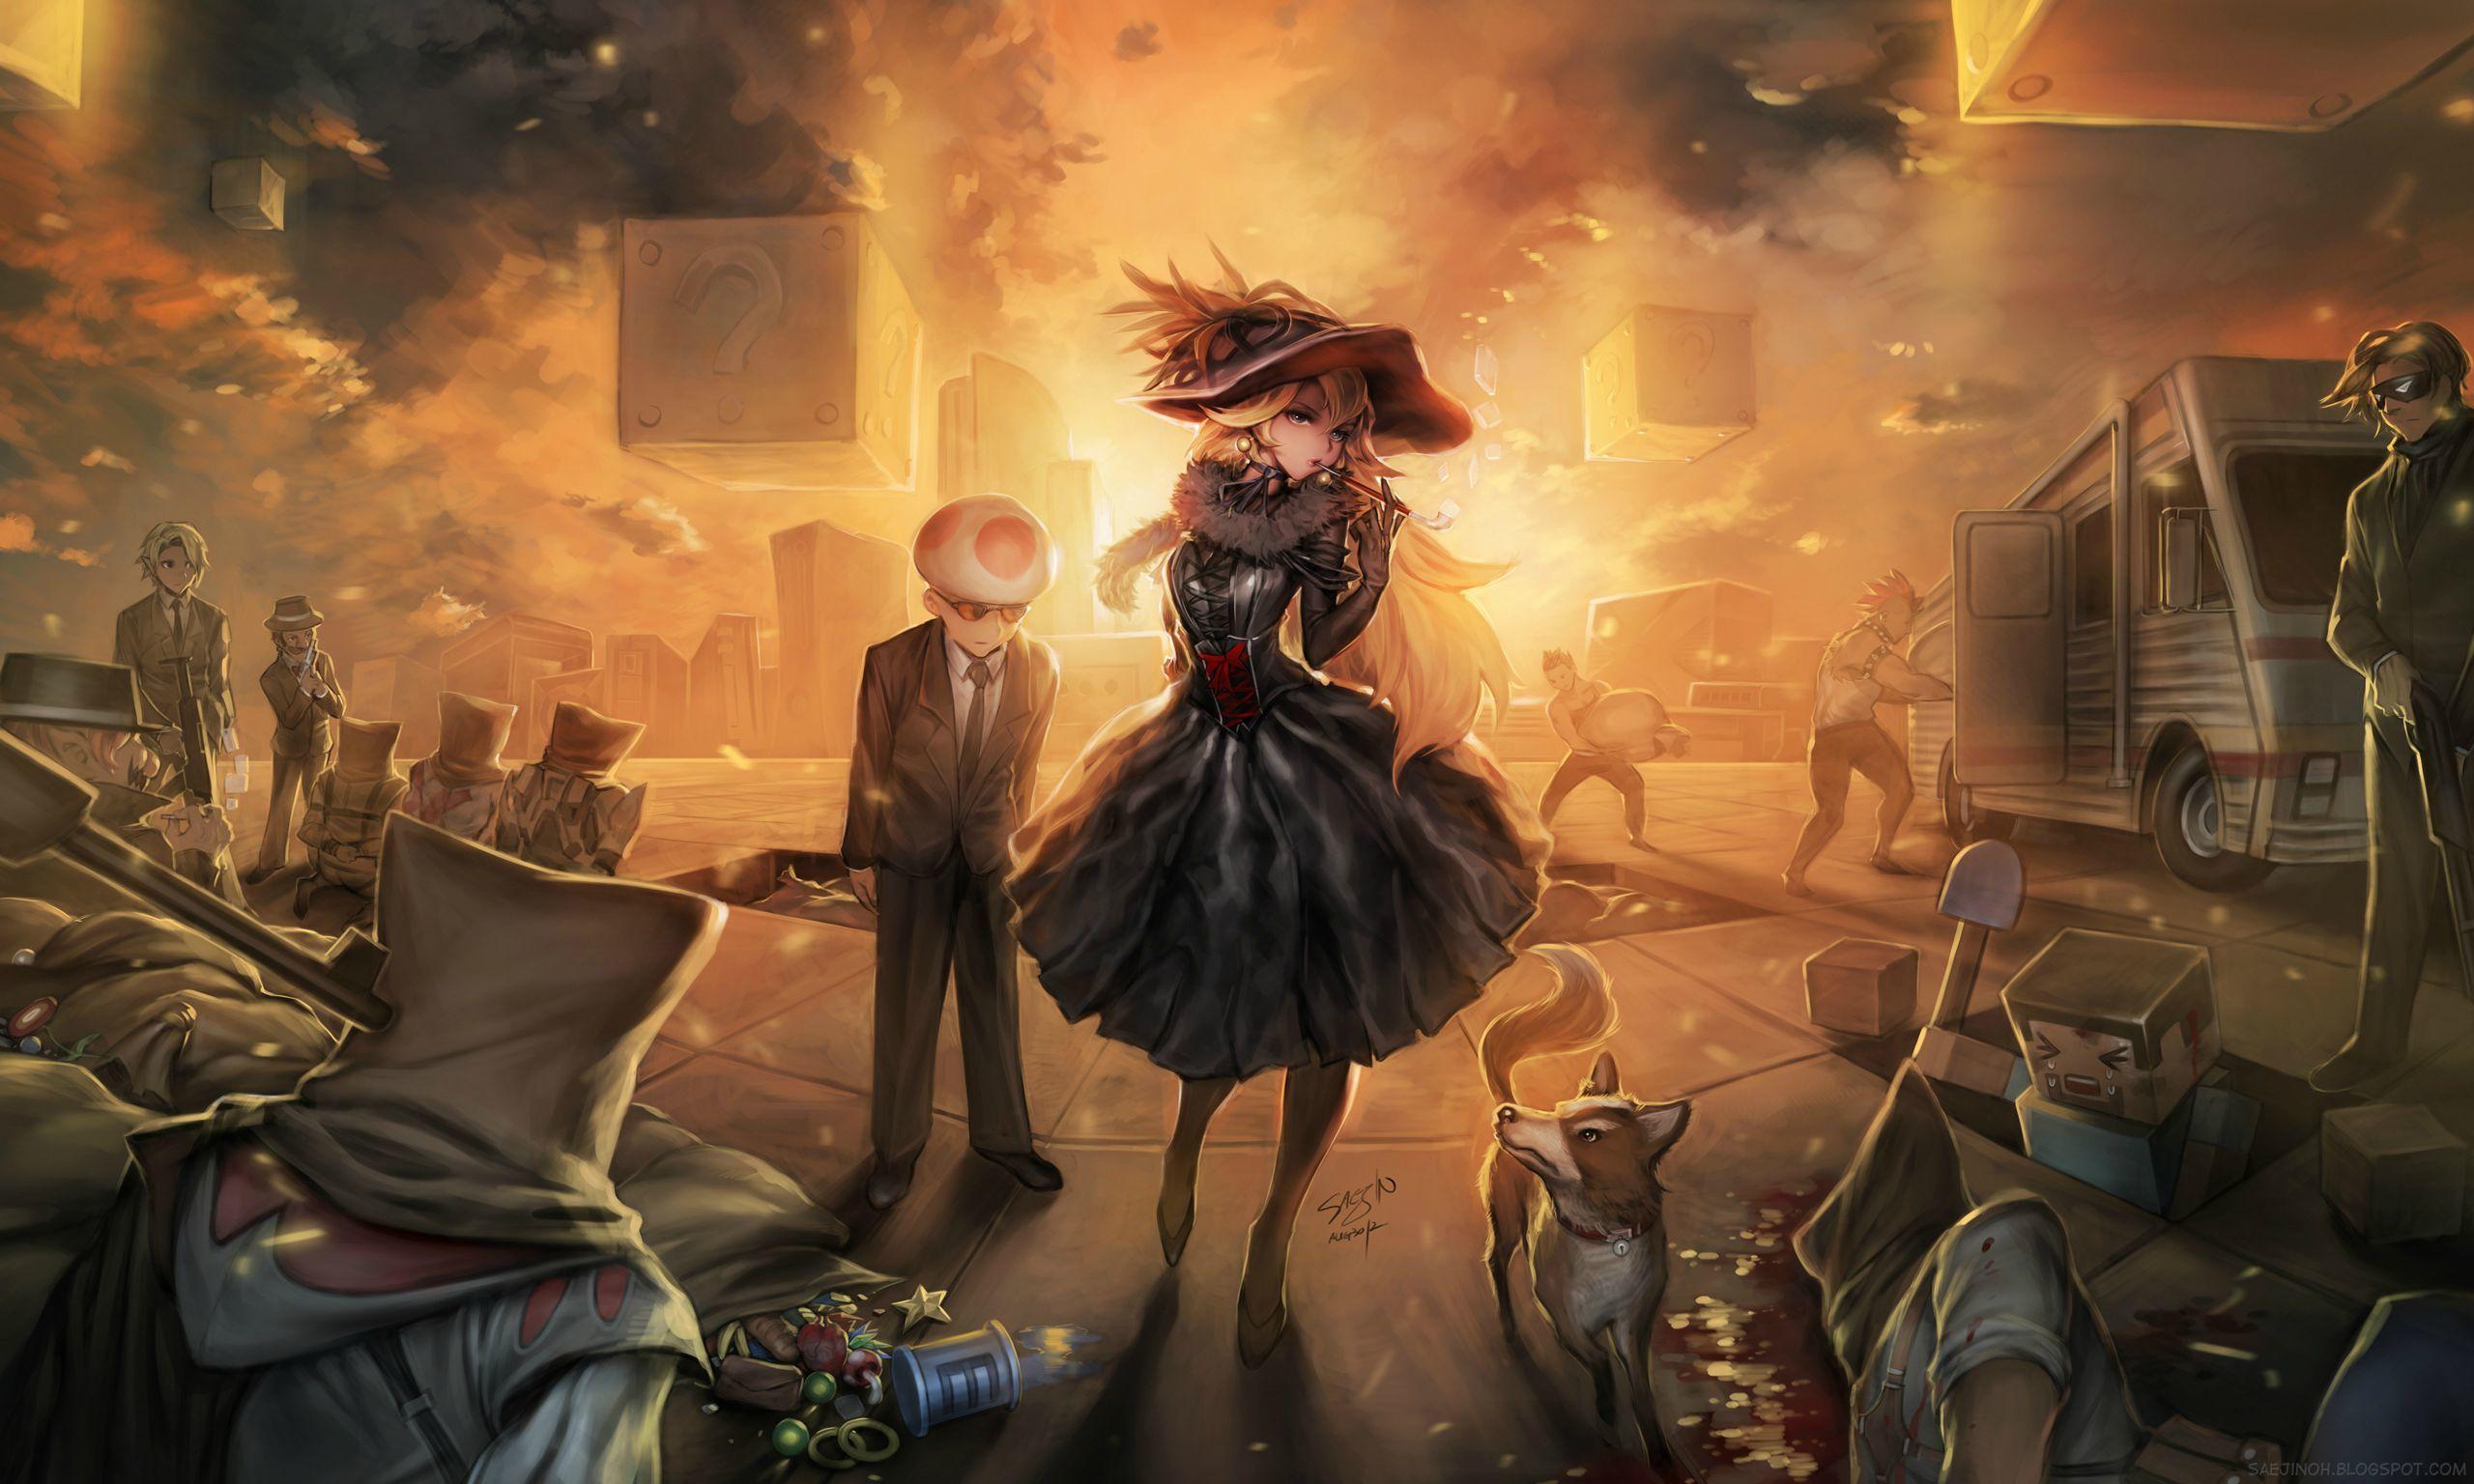 Download Wallpaper Girl Sunset Hat Art Cube Kratos